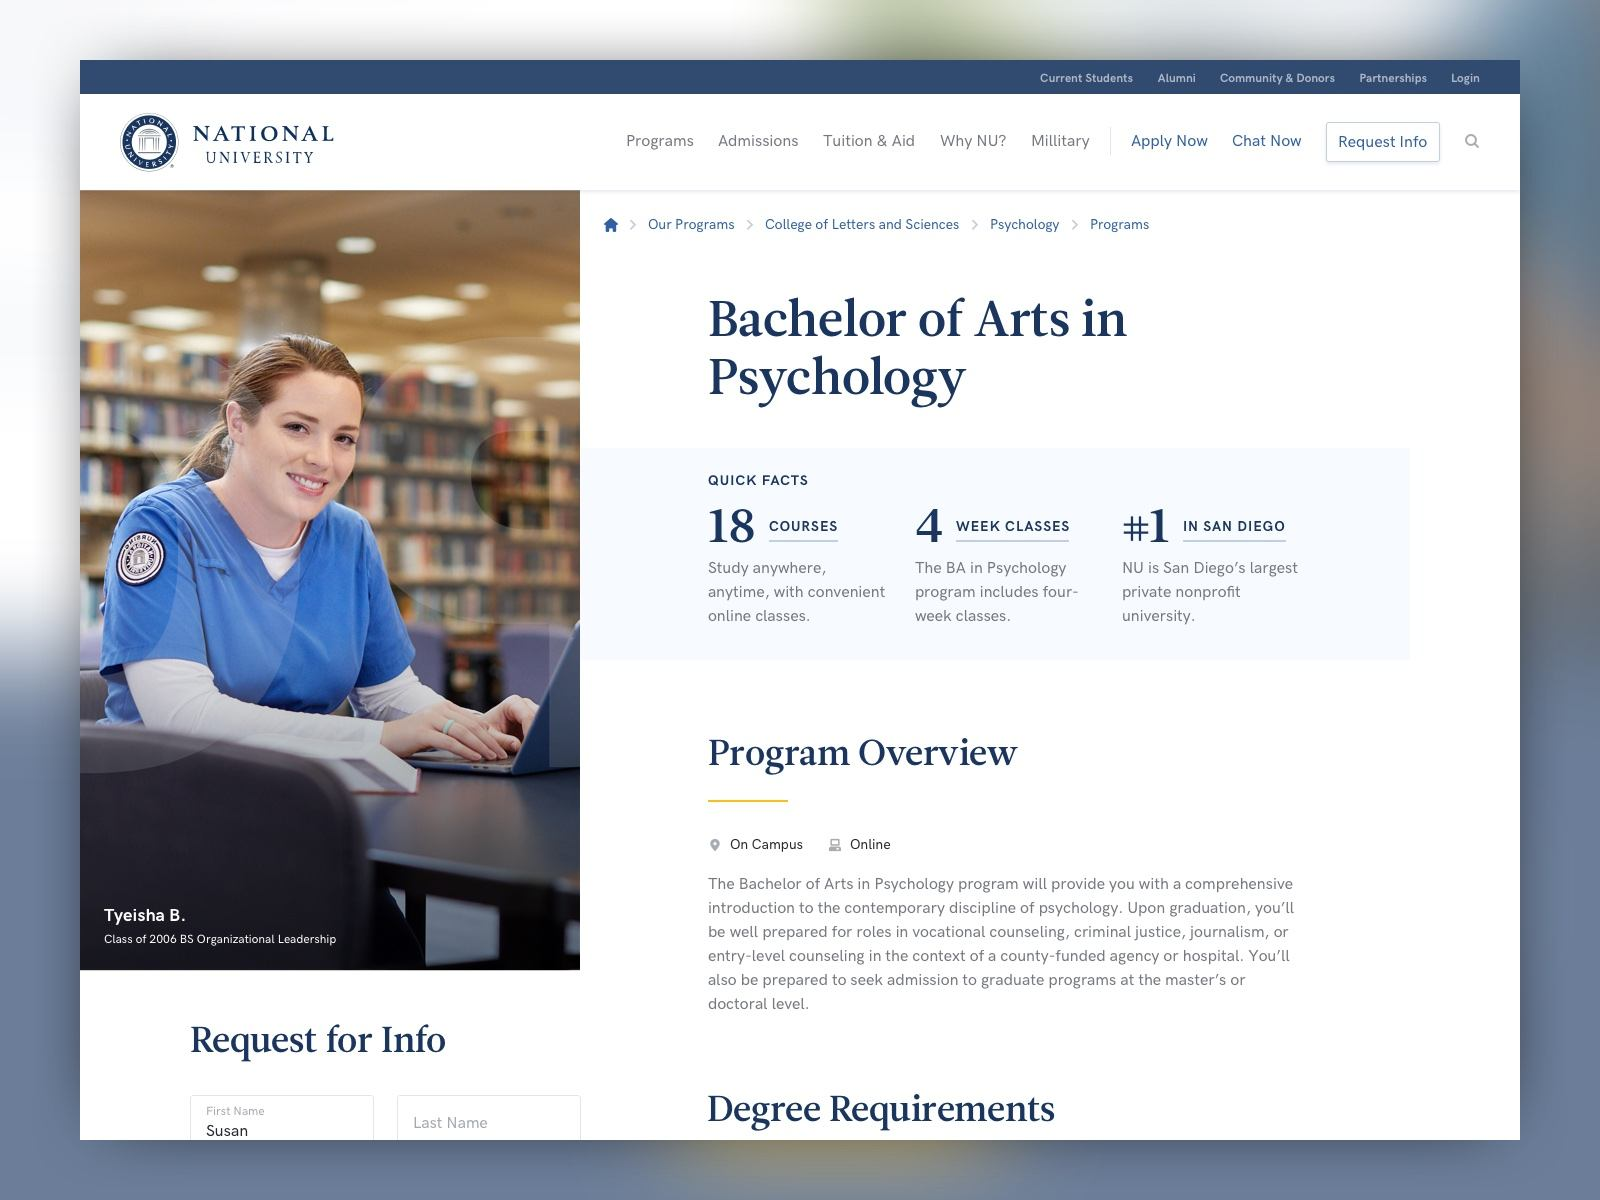 screenshot of a National University program page at desktop size